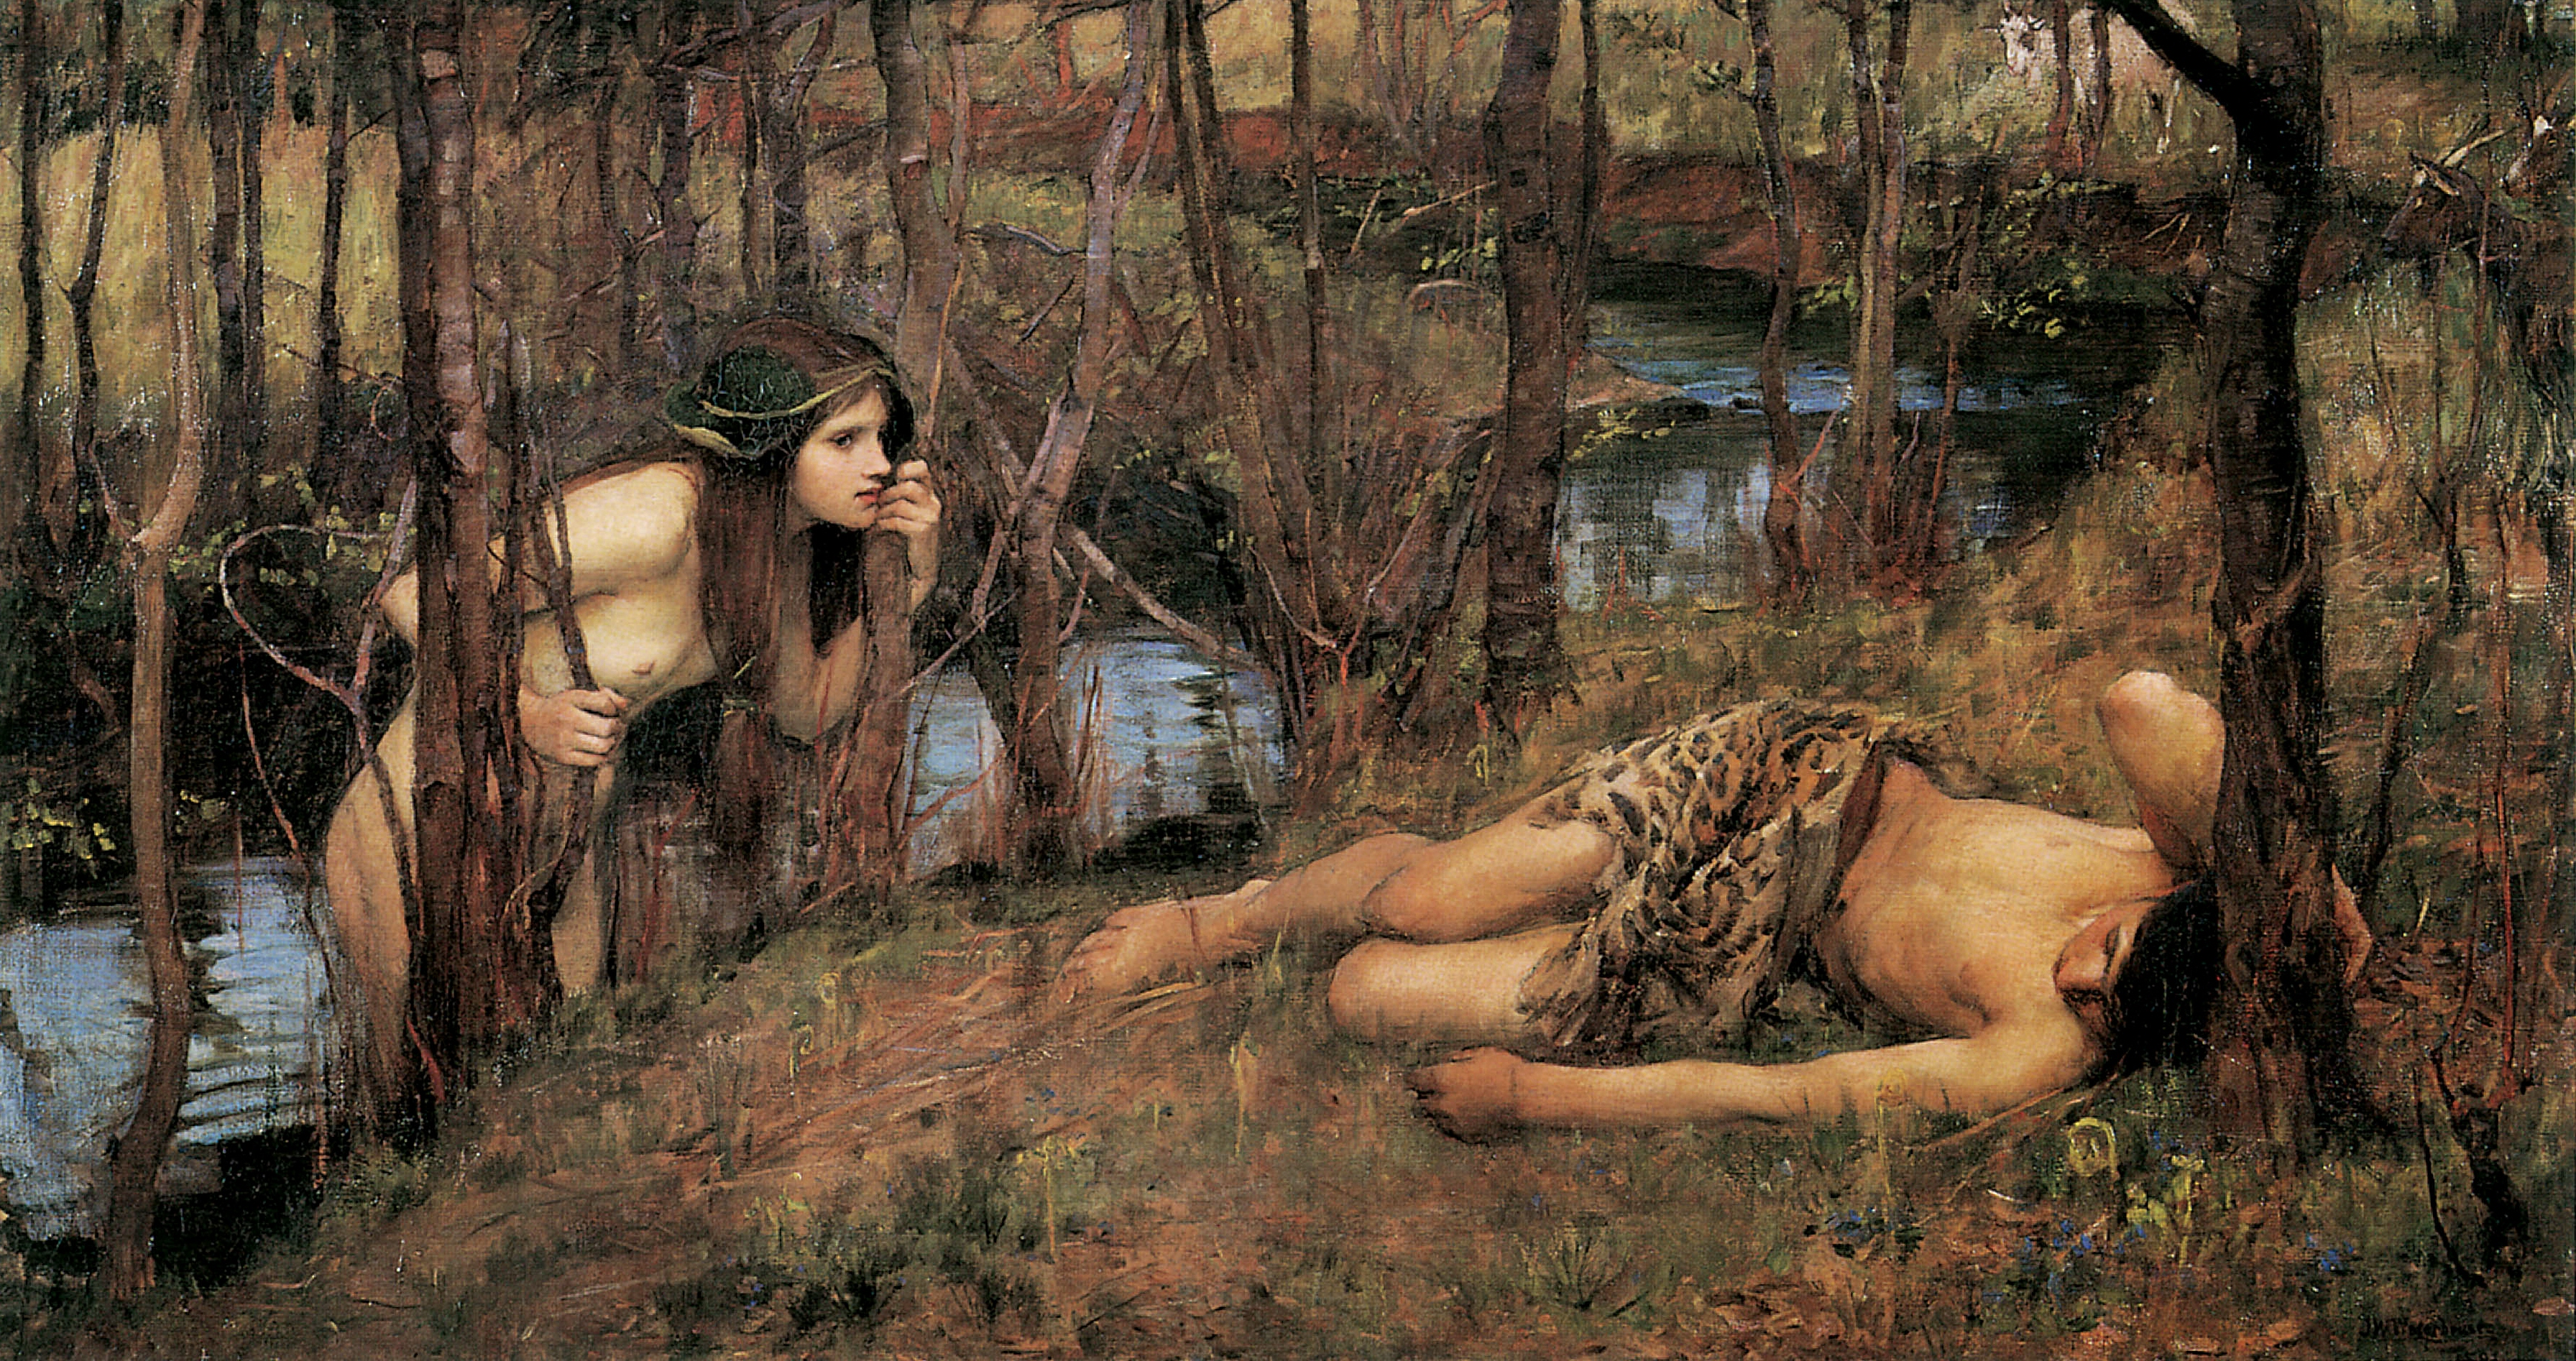 Risultati immagini per quadri di donne in compagnia